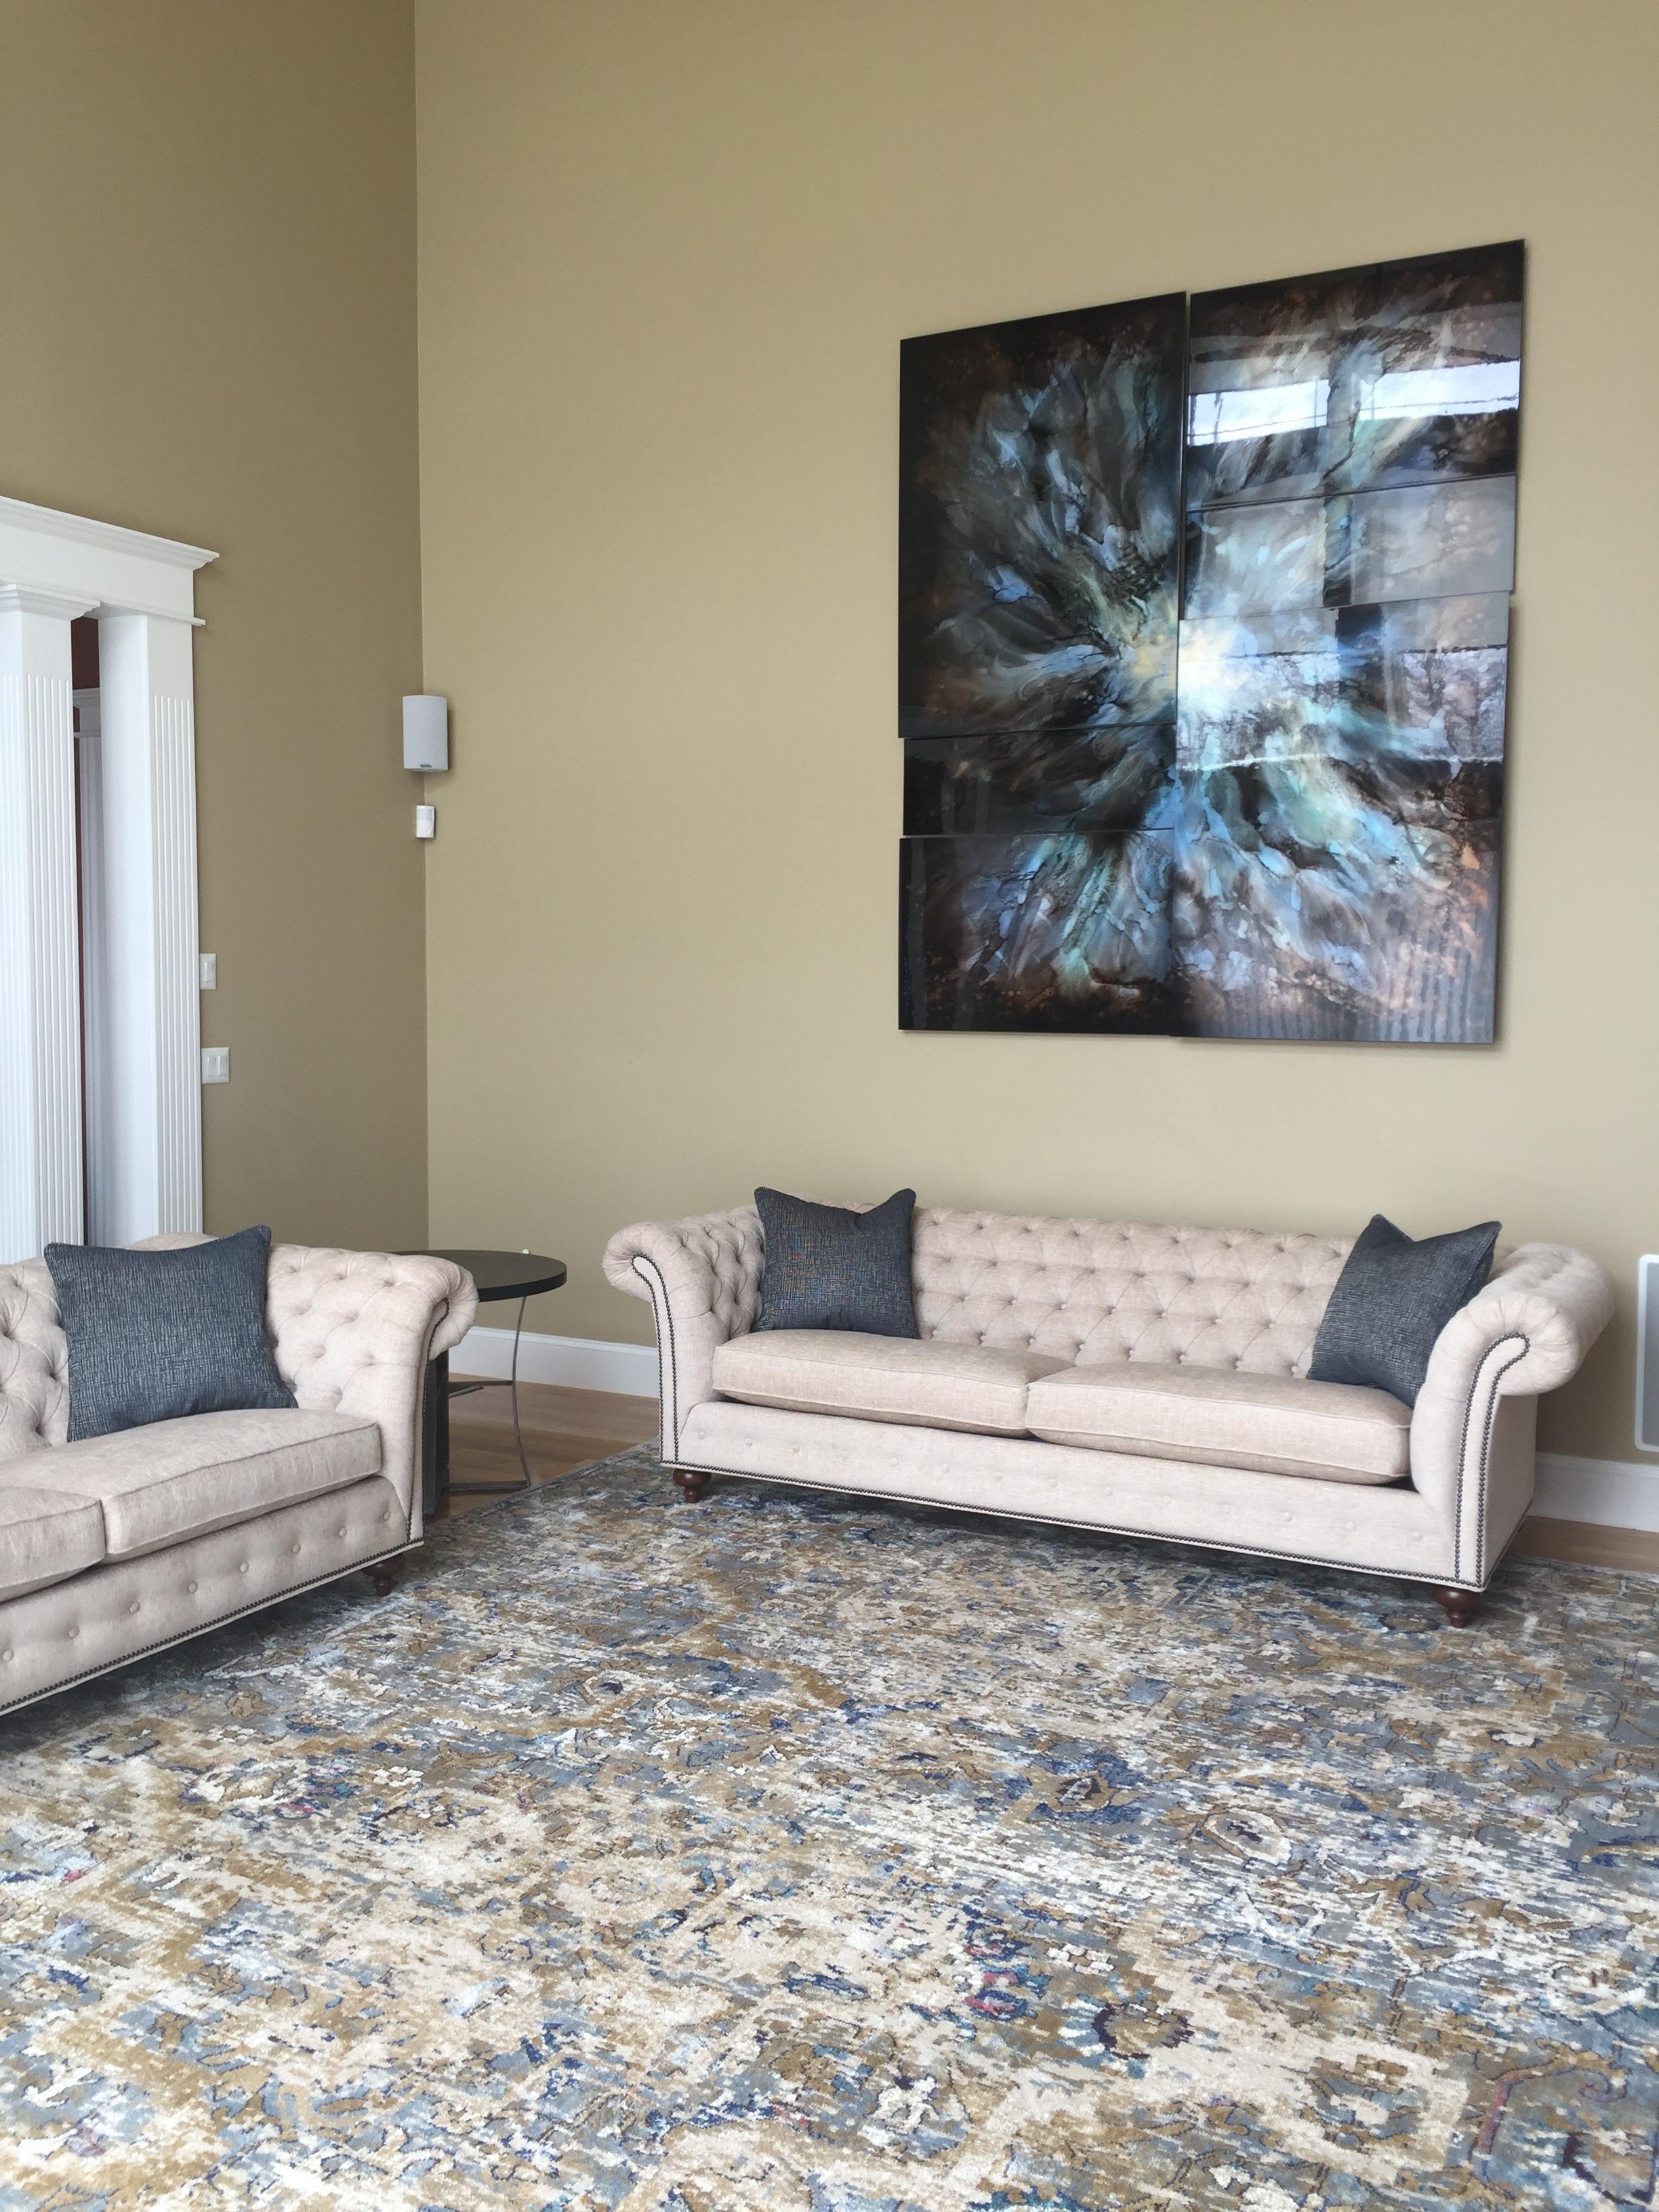 Family Room Design - Bolton, MA